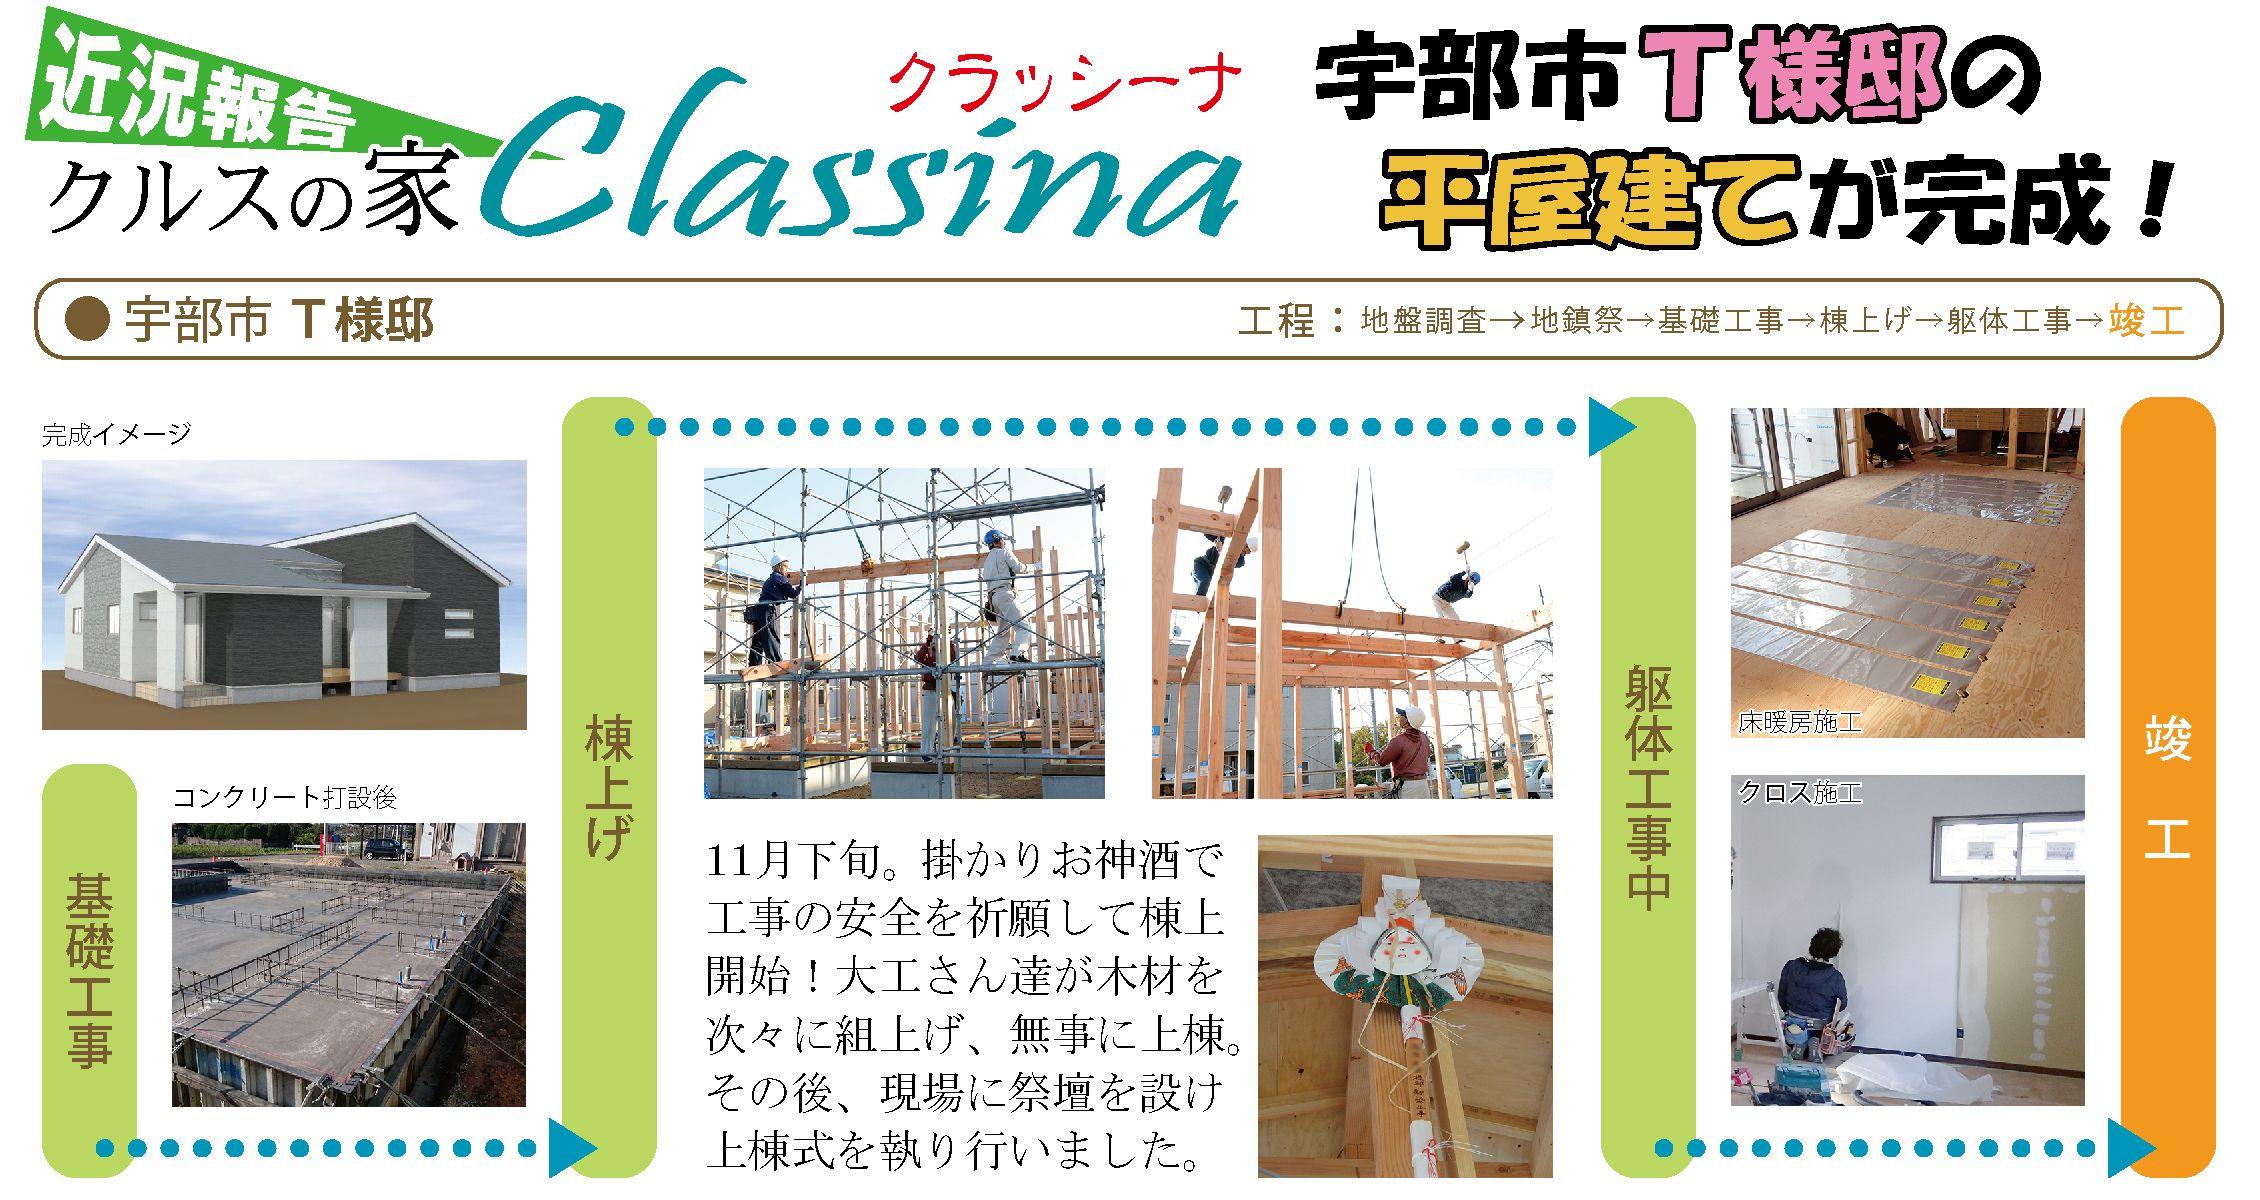 KuraSi-natu-sin102-021.jpg